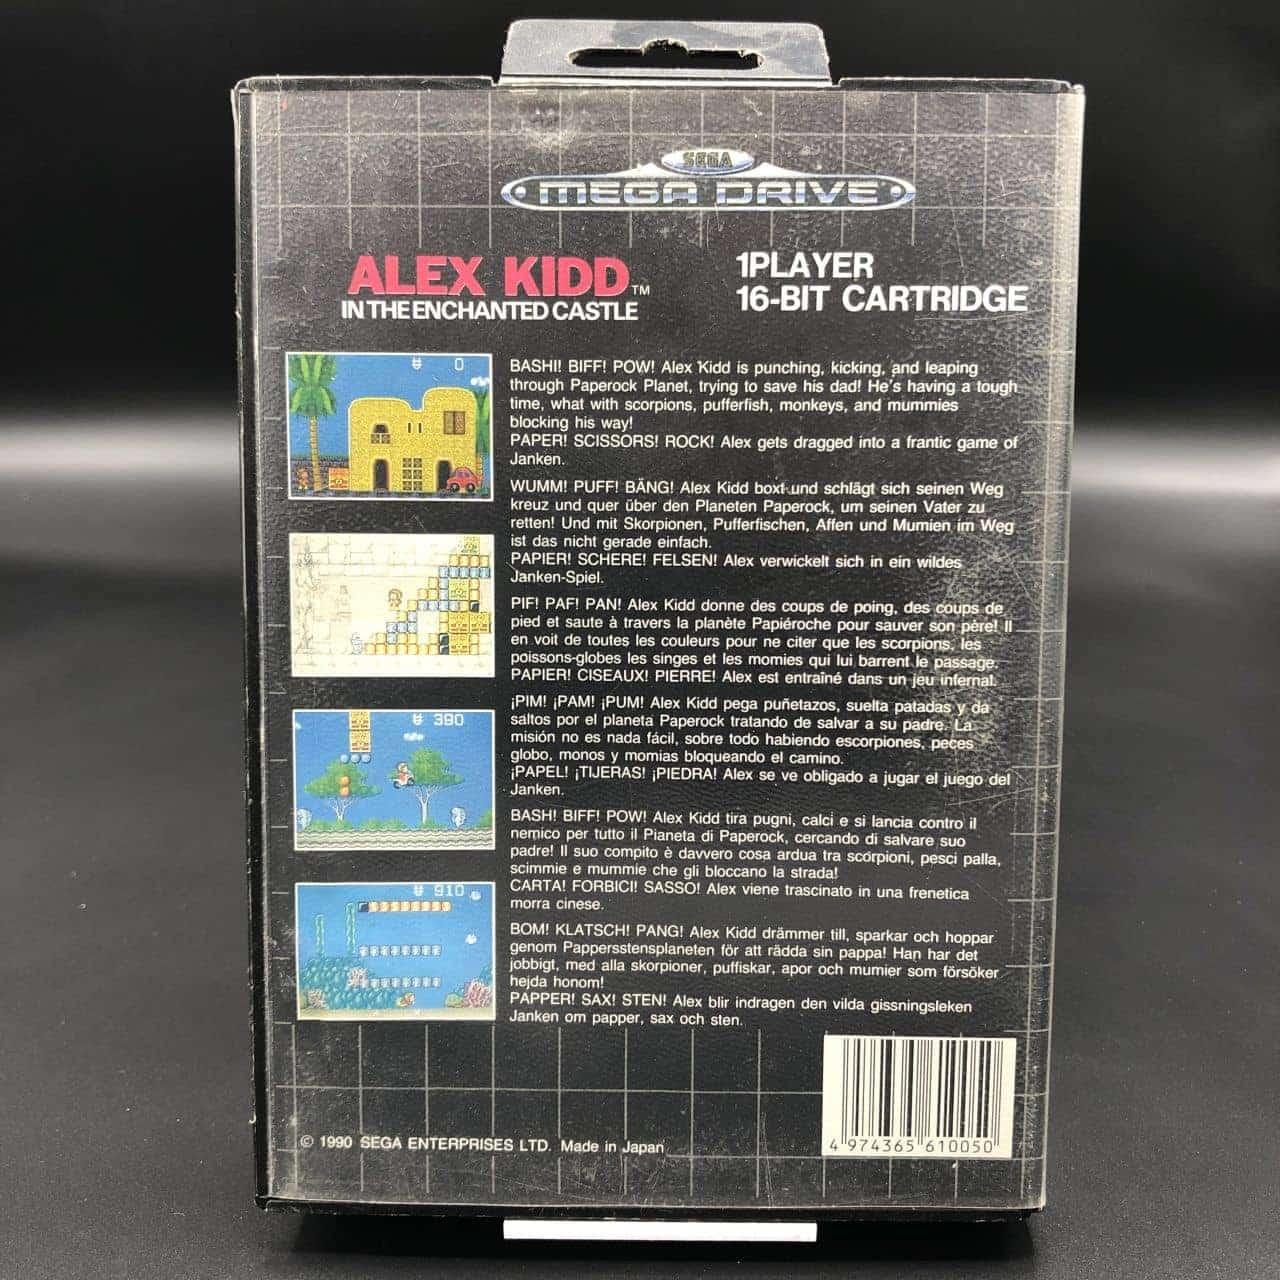 Alex Kidd in the Enchanted Castle (ohne Anleitung) (Gut) Sega Mega Drive